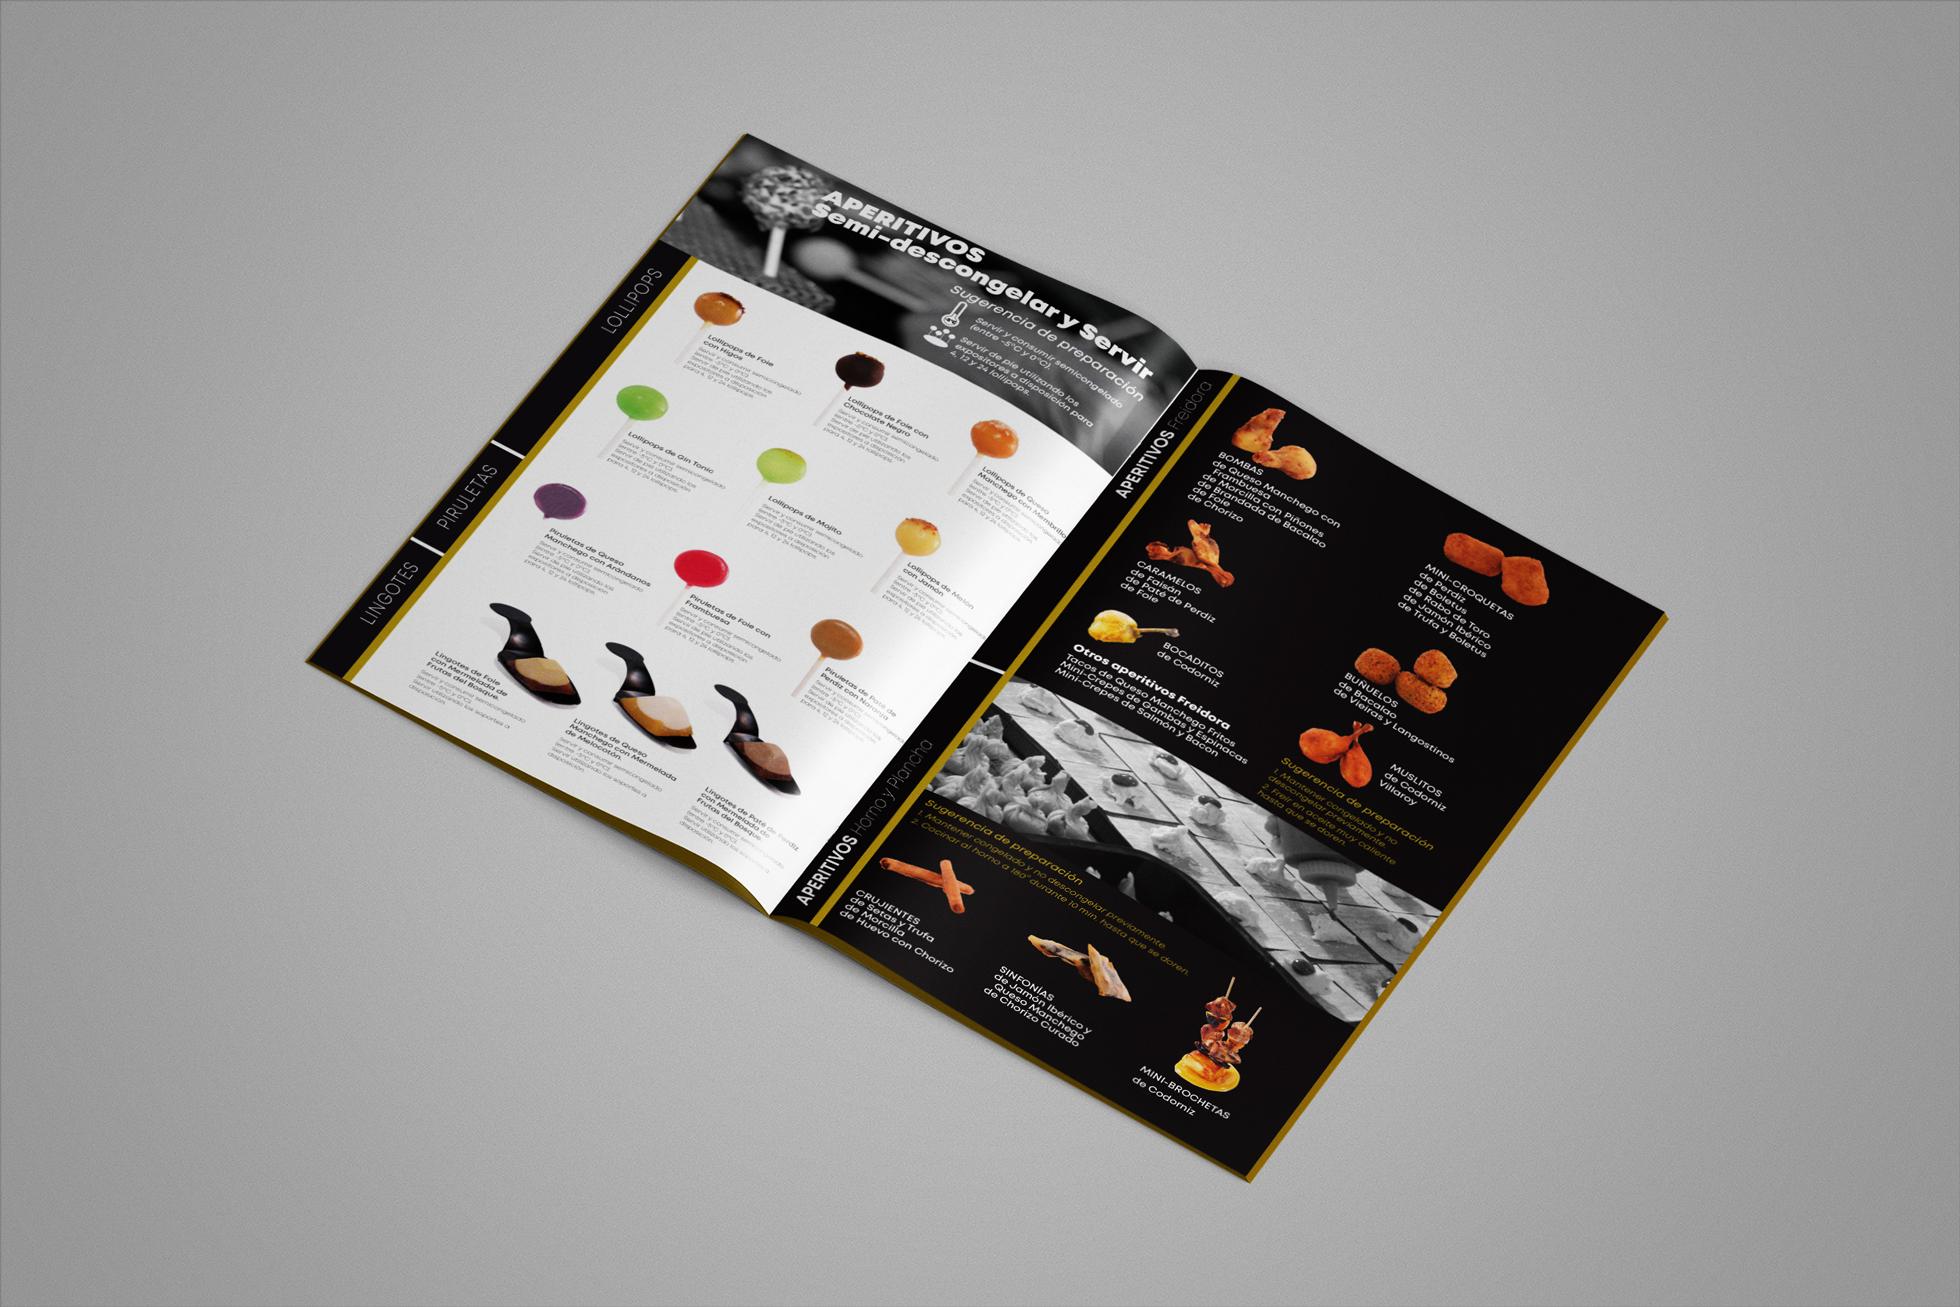 diseño catálogo abierto marca conservas